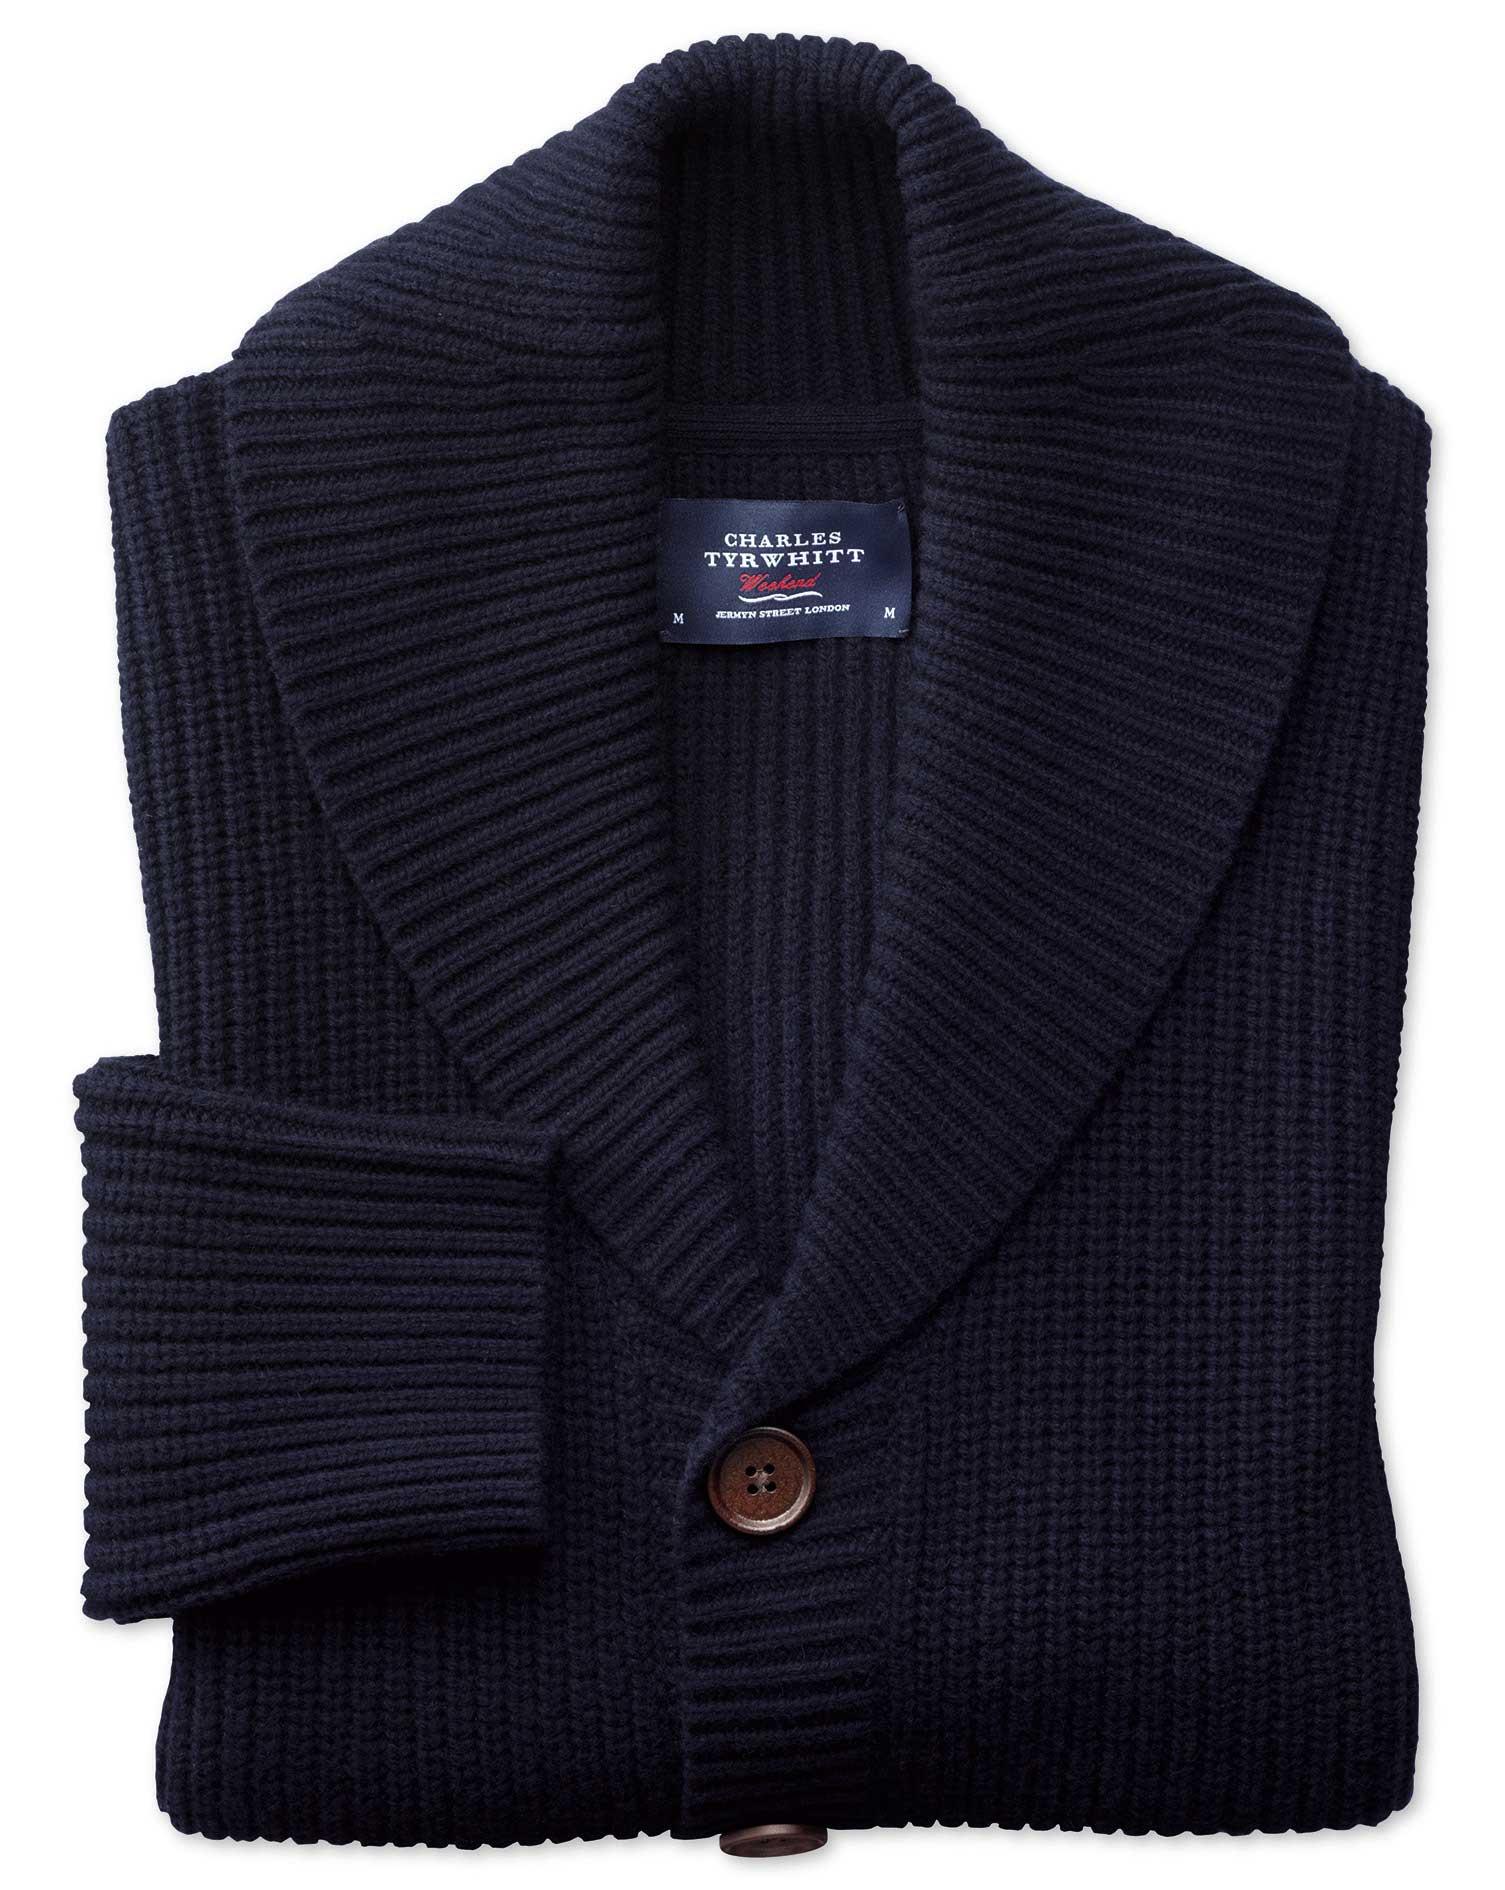 Navy Rib Shawl Collar Wool Cardigan Size Large by Charles Tyrwhitt